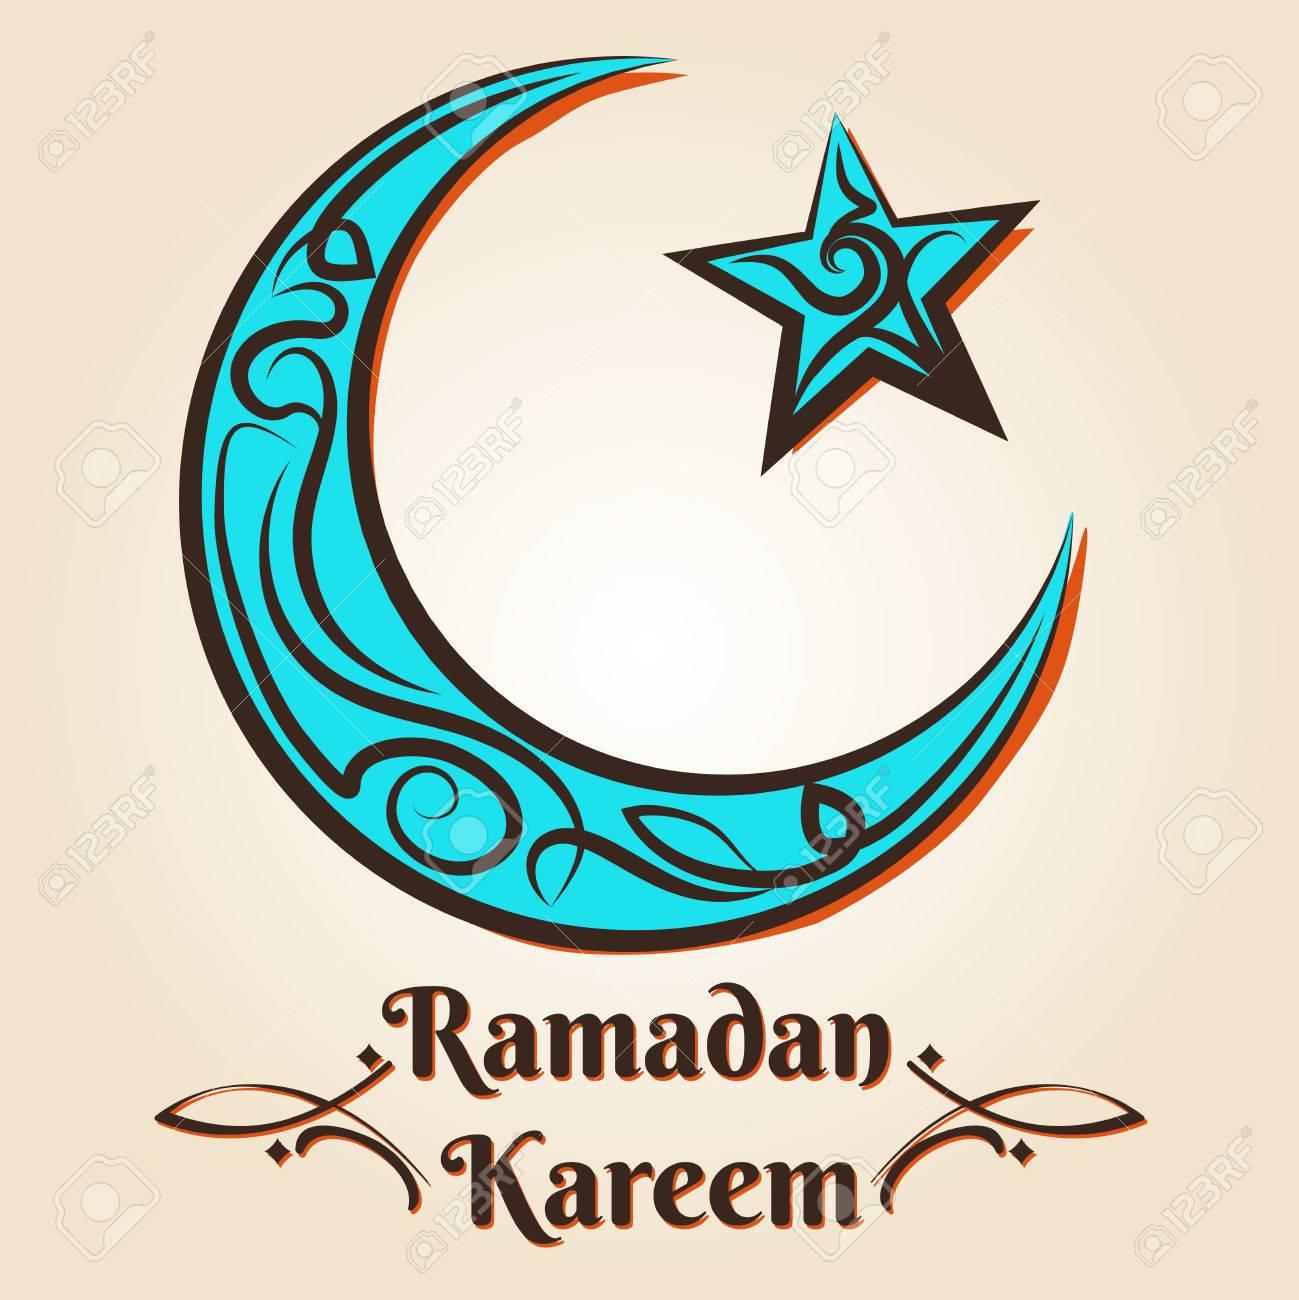 ramadan kareem logo vector arabic islamic emblem with ornate rh 123rf com islamic logos photos islamic logo